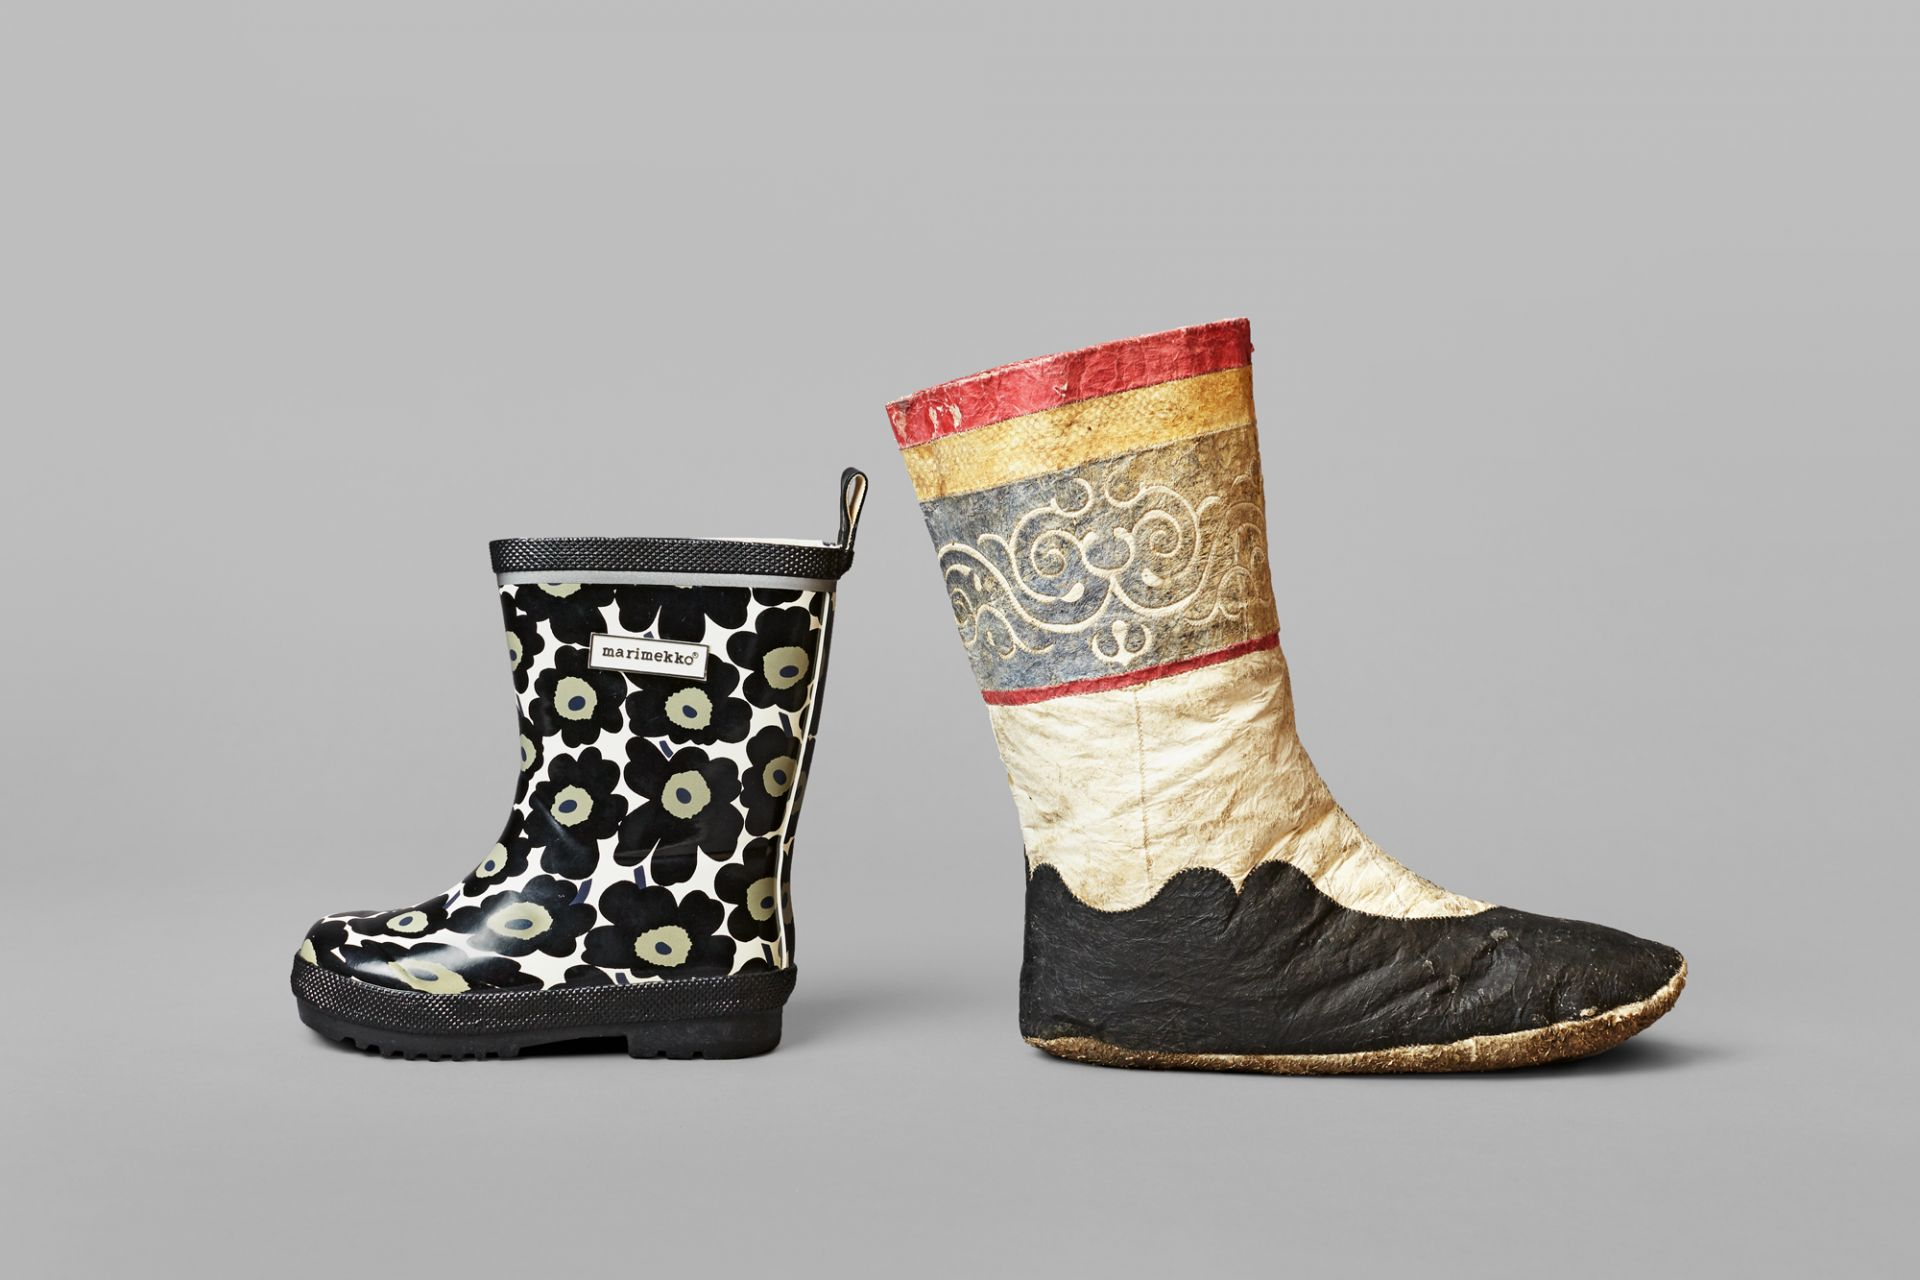 Children boot with salmon leather, Siberia, early 20th century and children's rubber boot, Unikko-Saapas, marimekko, Helsinki, Finland, 2005/06